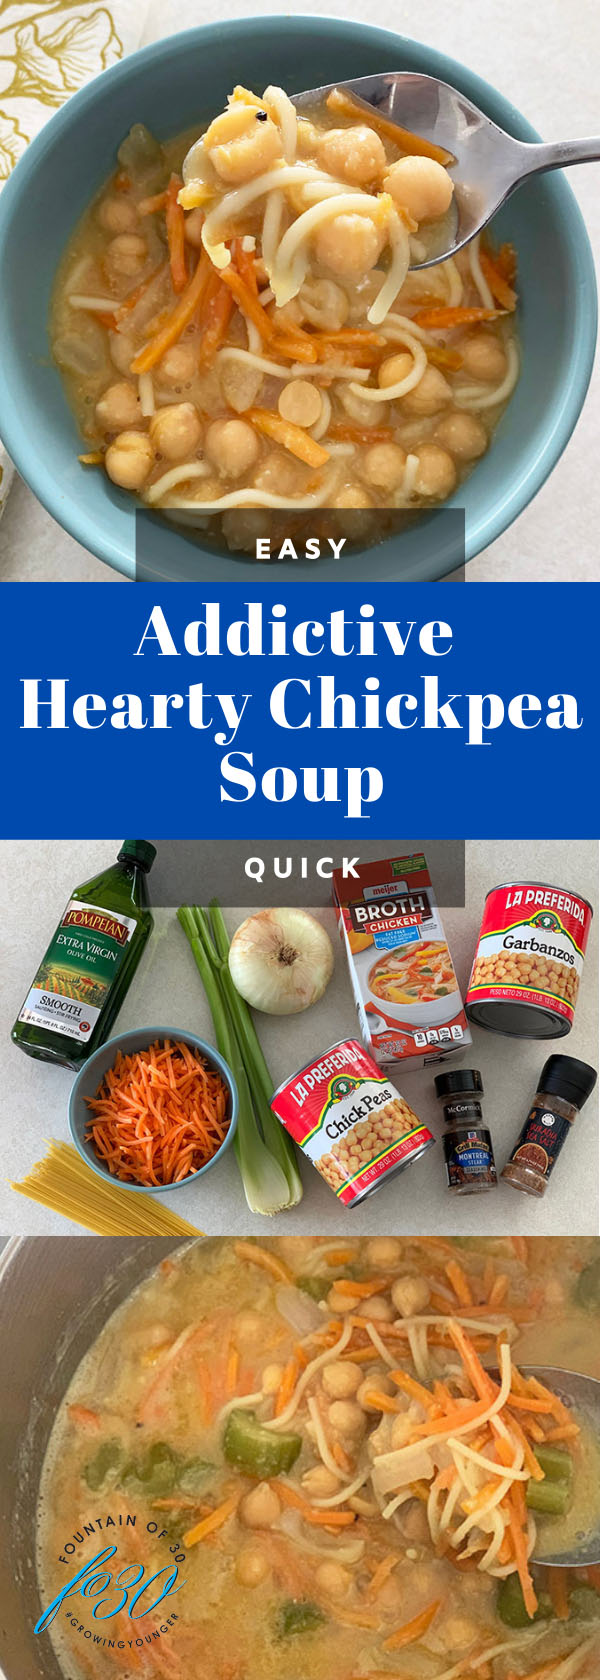 easy chickpea soup fountainof30